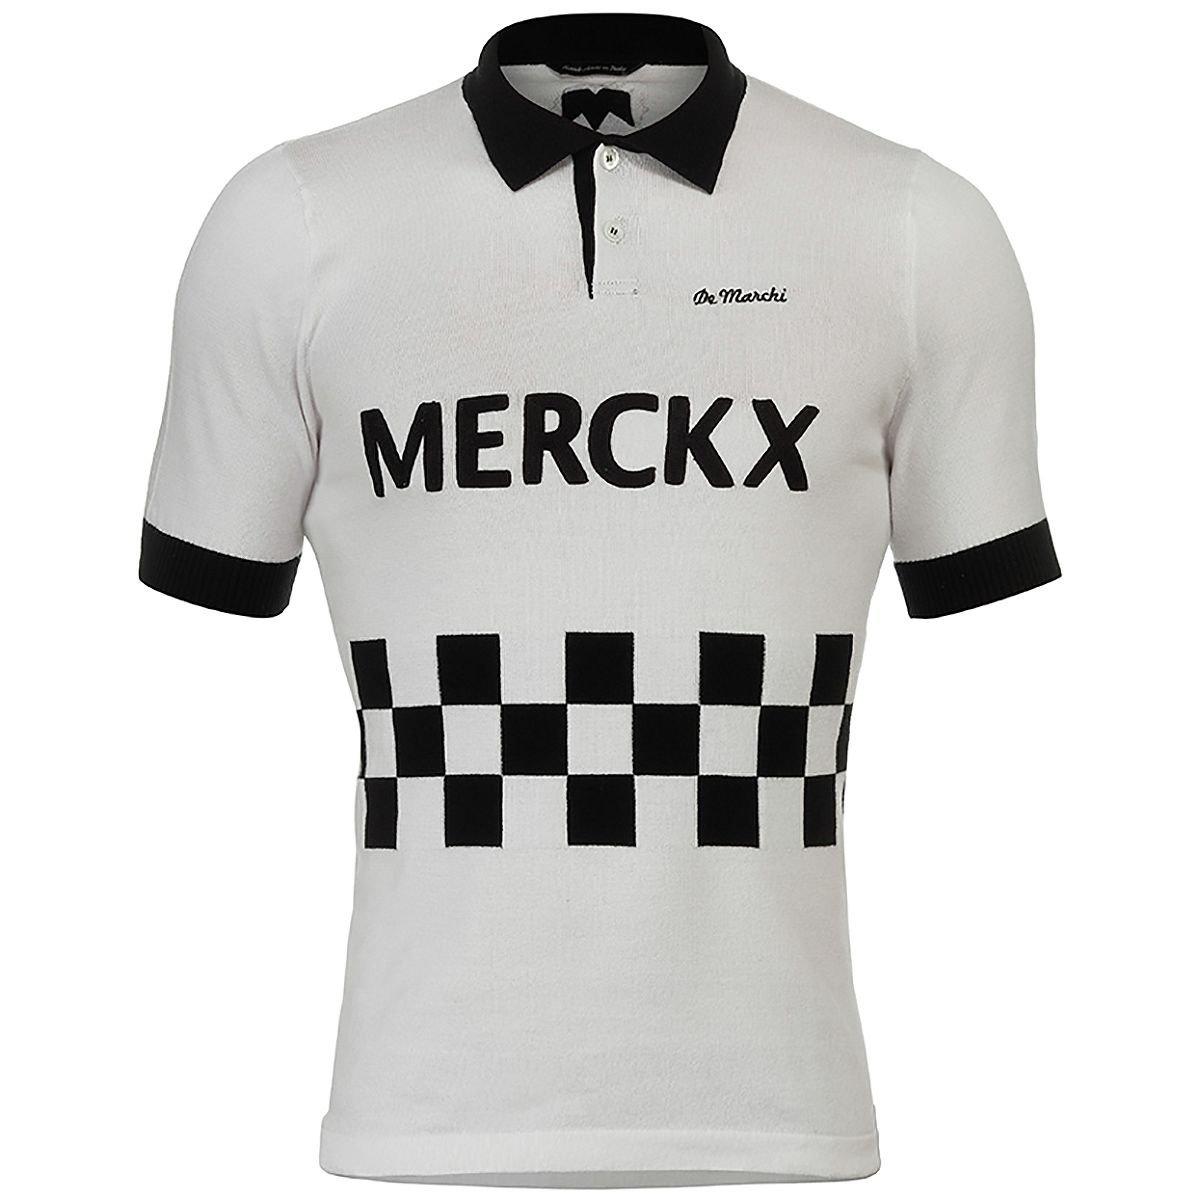 De Marchi Blockhaus 67コットンPolo Jersey – Men 's XL ホワイト/ブラック B072Q1G5MK